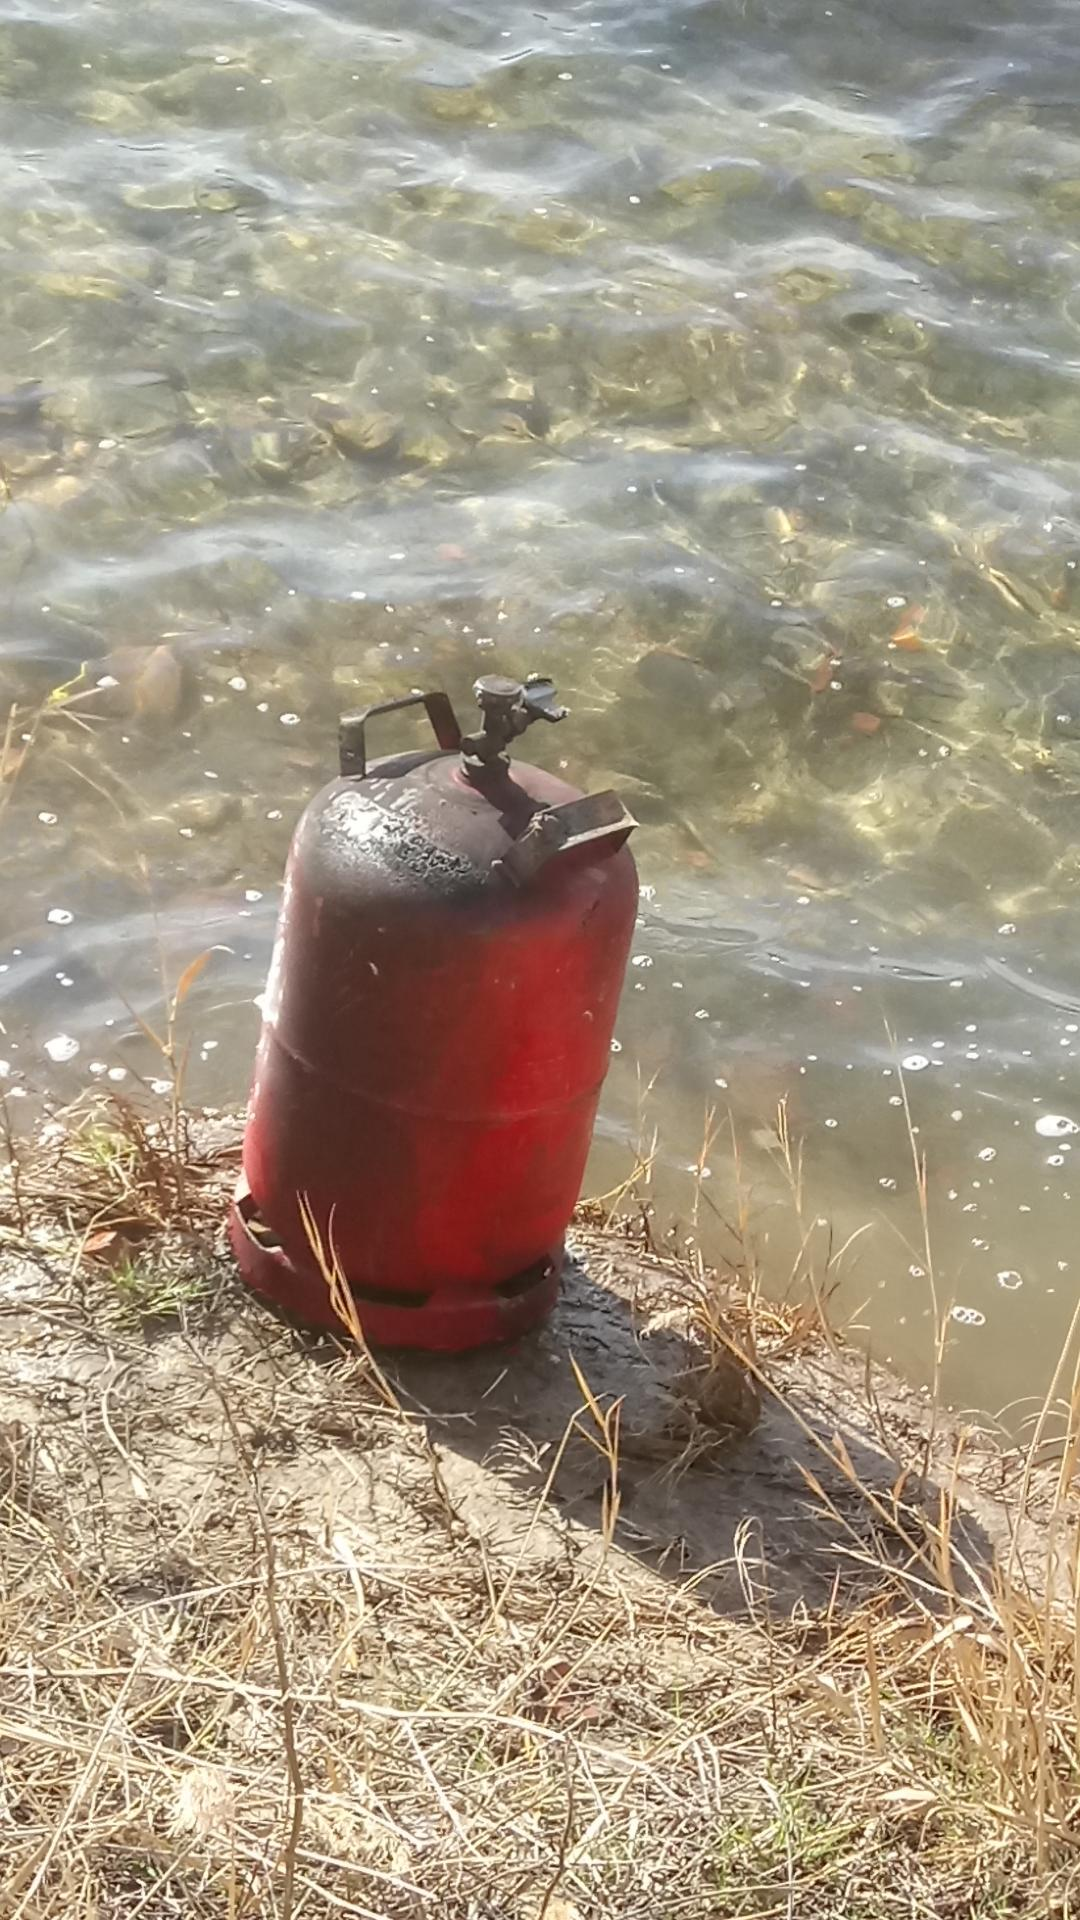 Schachtsee Gasflasche 2